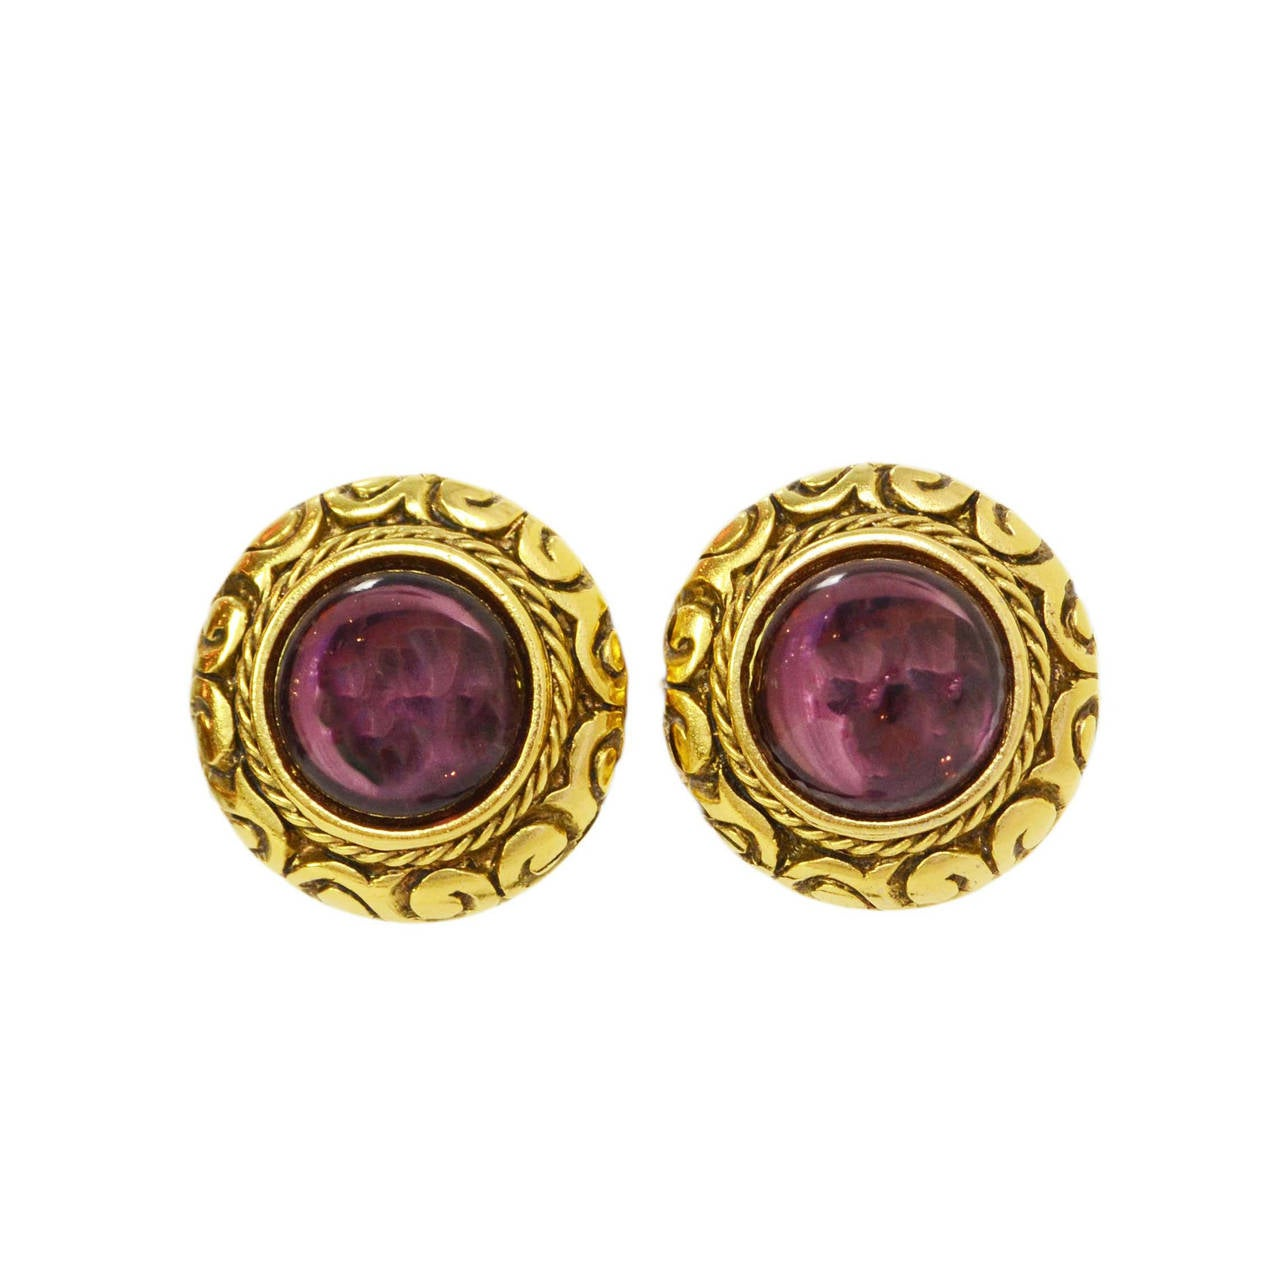 CHANEL Vintage '90s Gold & Purple Gripoix Clip On Earrings